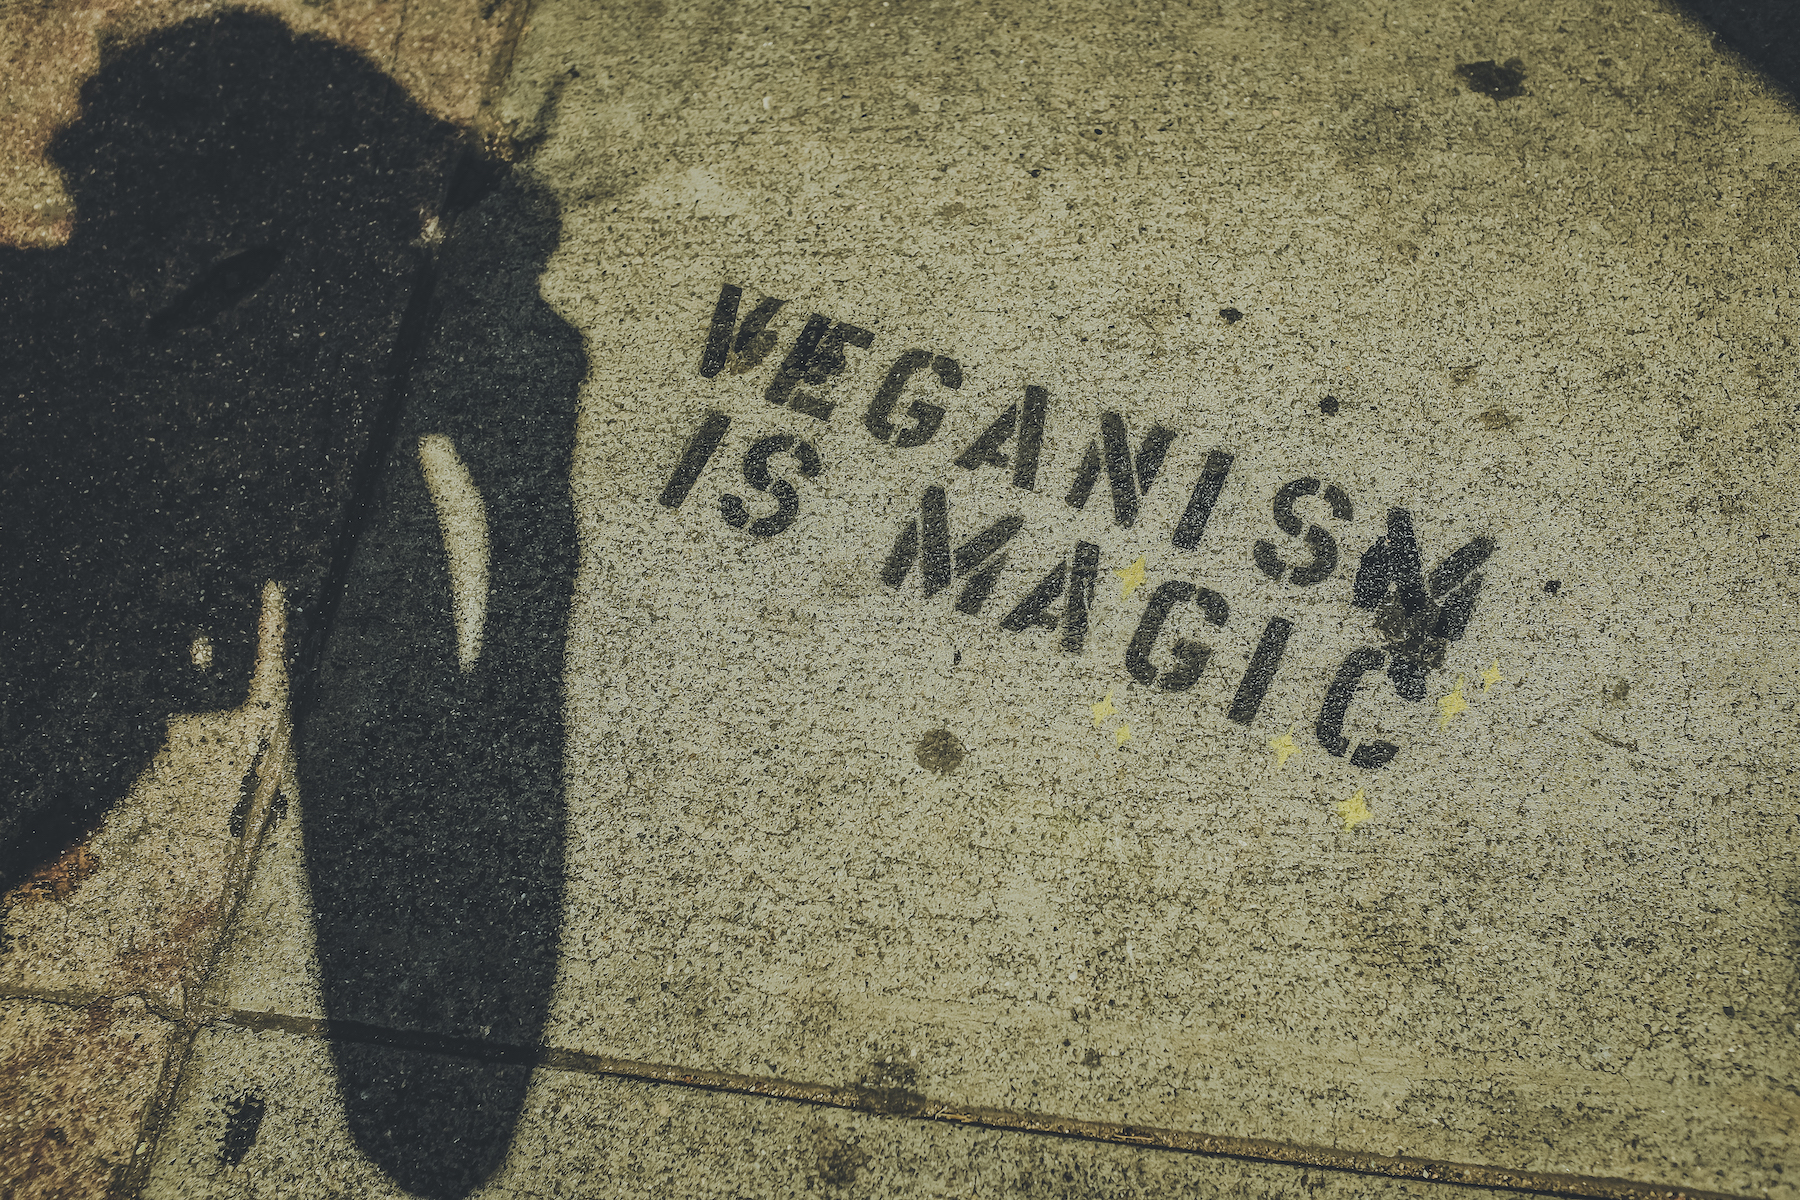 GeheimtippMuenchen Top7 Veganuar Food Vegan2 – ©Unsplash